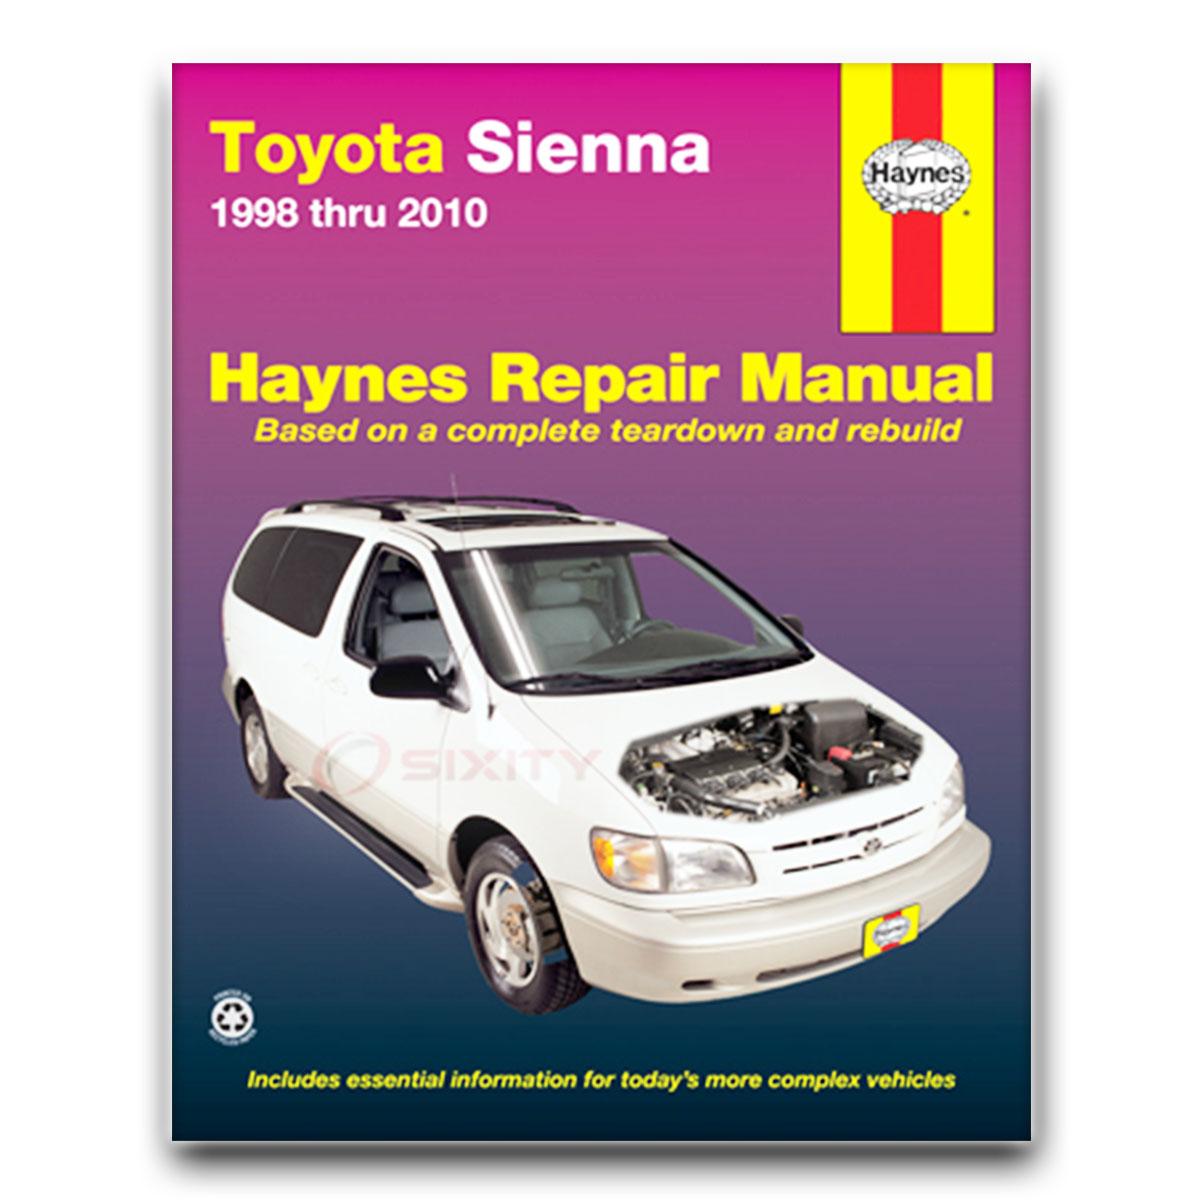 3019092090image1 haynes toyota sienna 98 09 repair manual 92090 shop service garage toyota tacoma repair diagrams at readyjetset.co